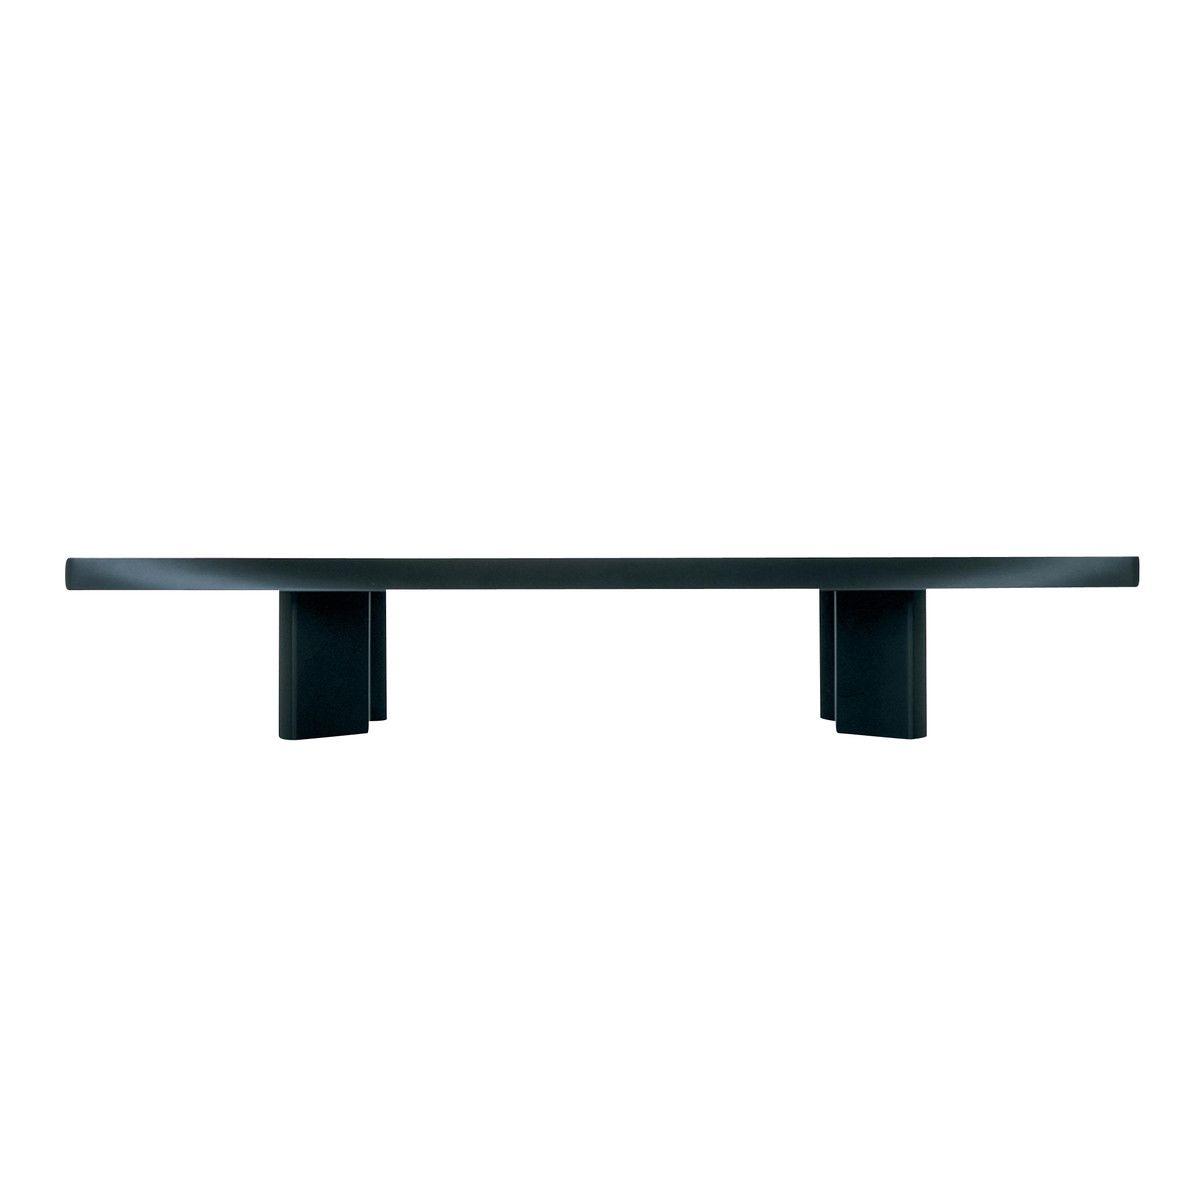 Préférence 515 Plana - Table basse   Cassina   AmbienteDirect.com WD91